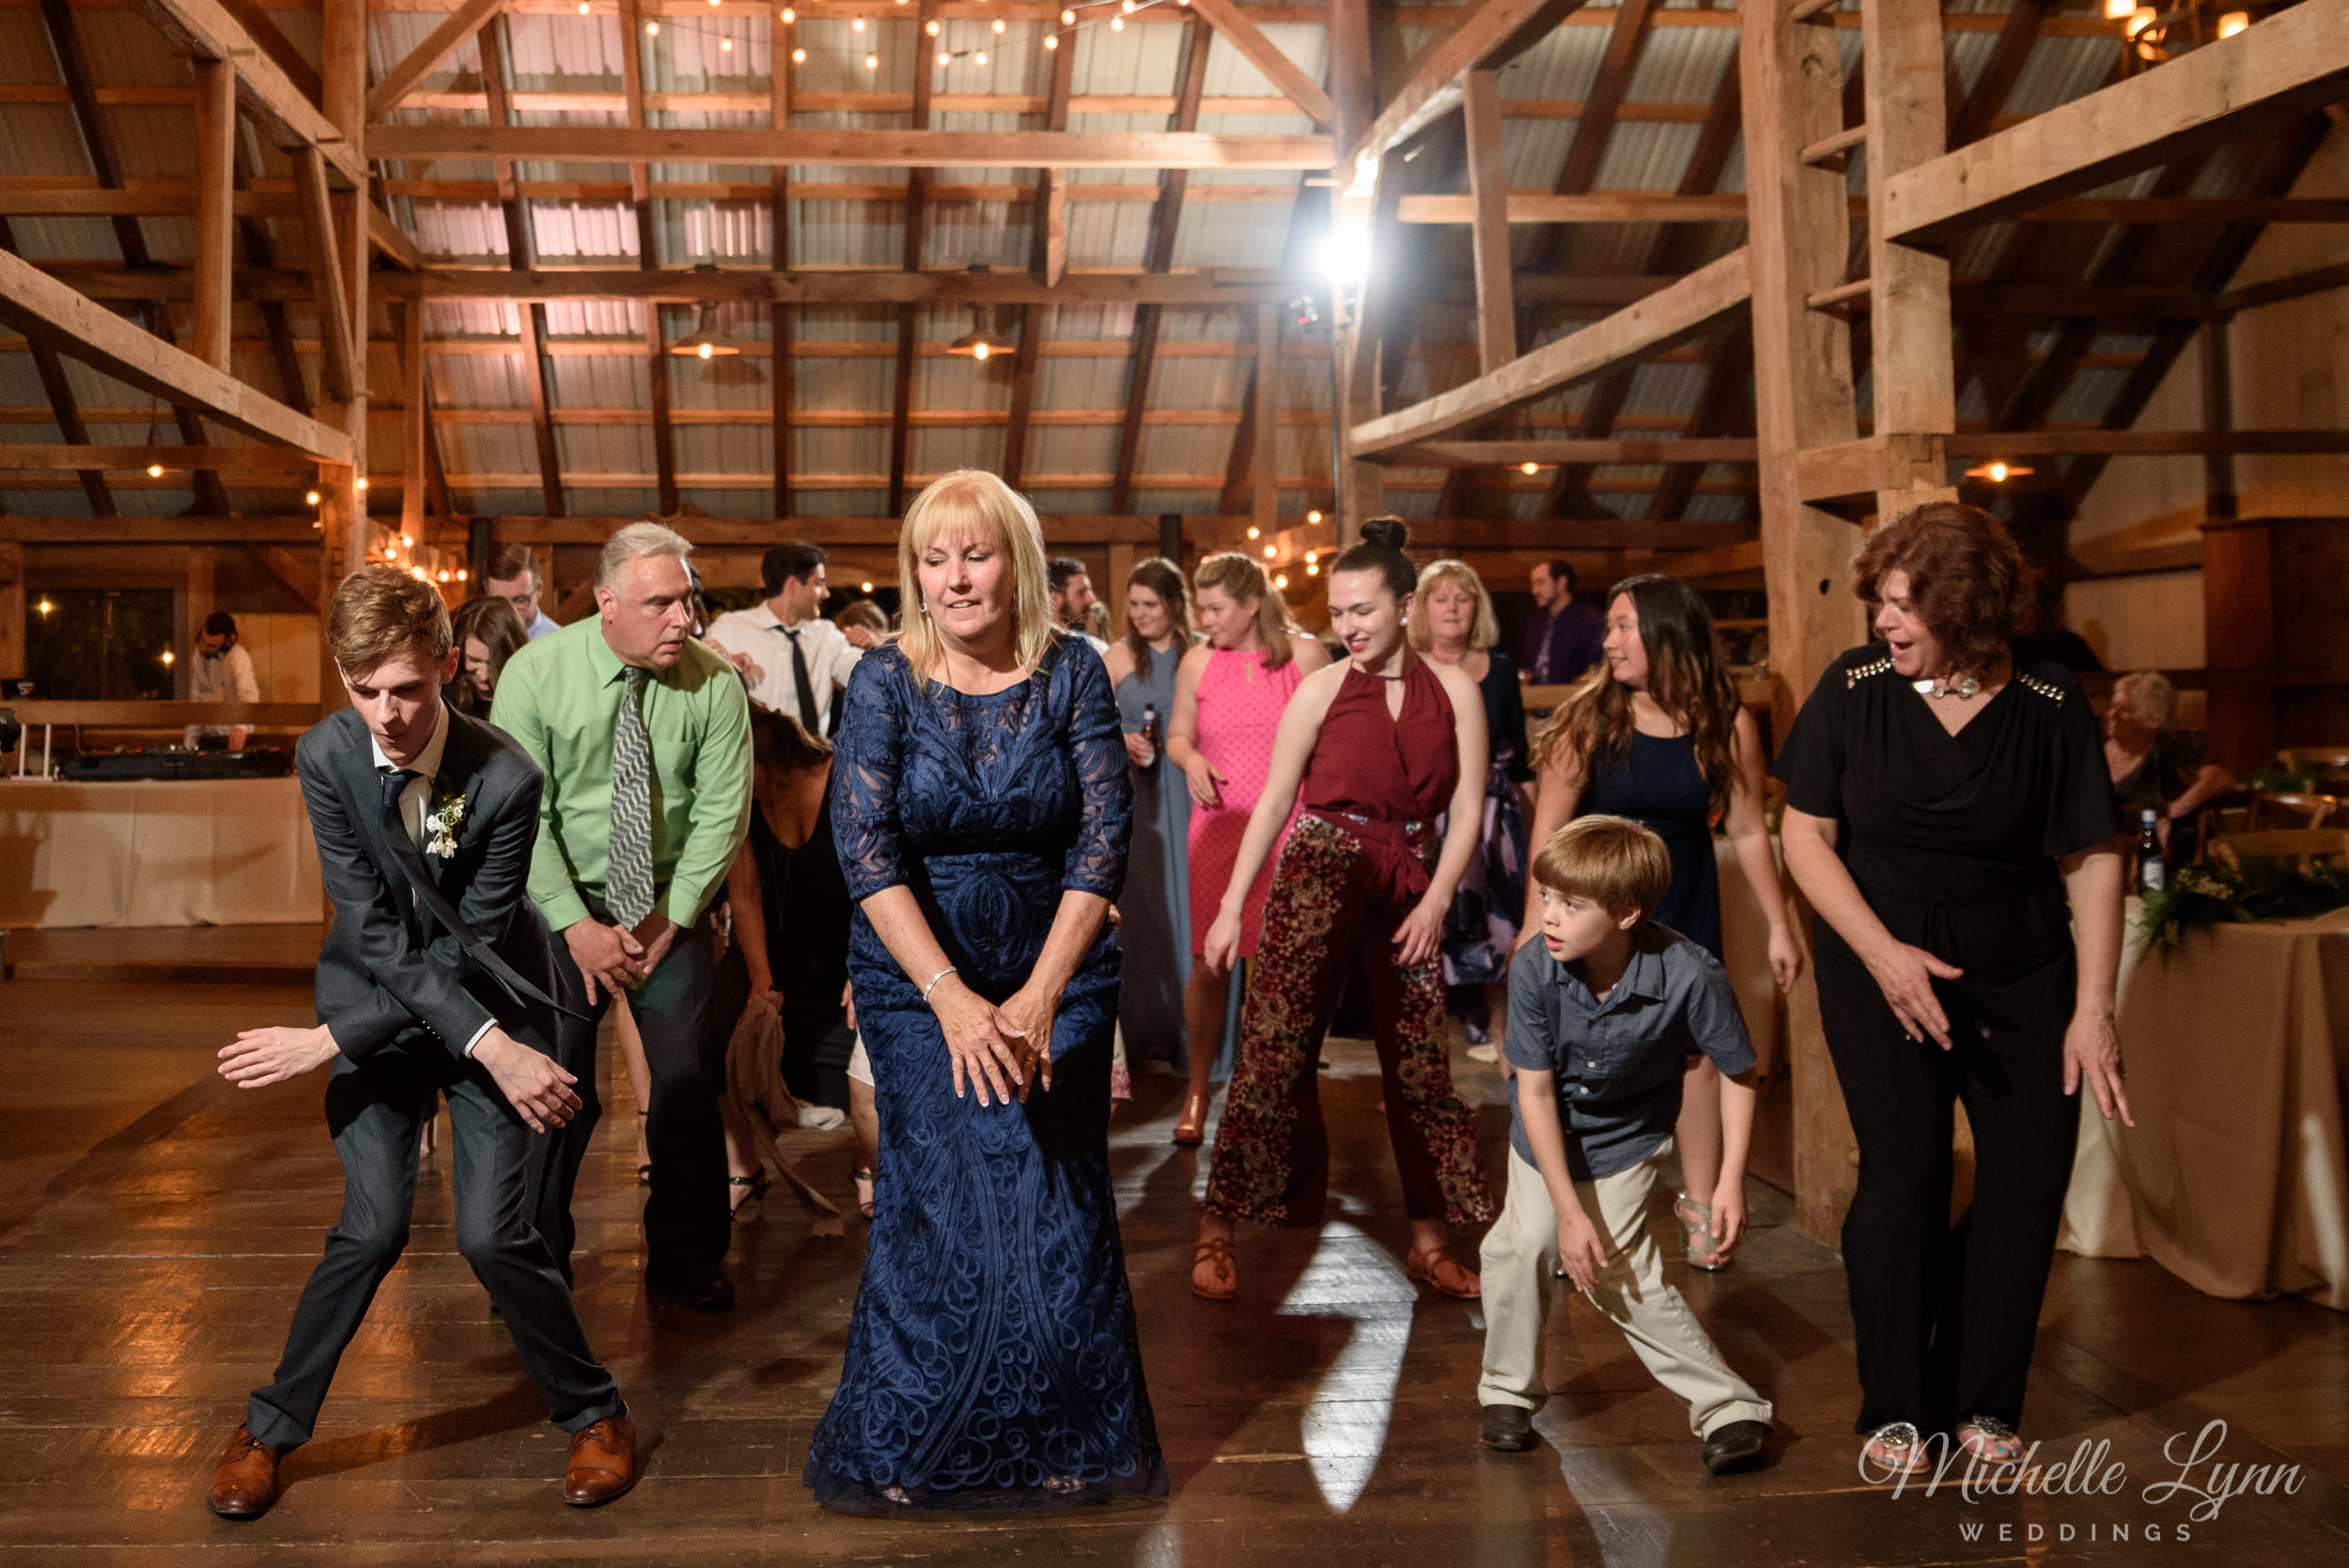 mlw-the-farm-bakery-and-events-wedding-photos-91.jpg